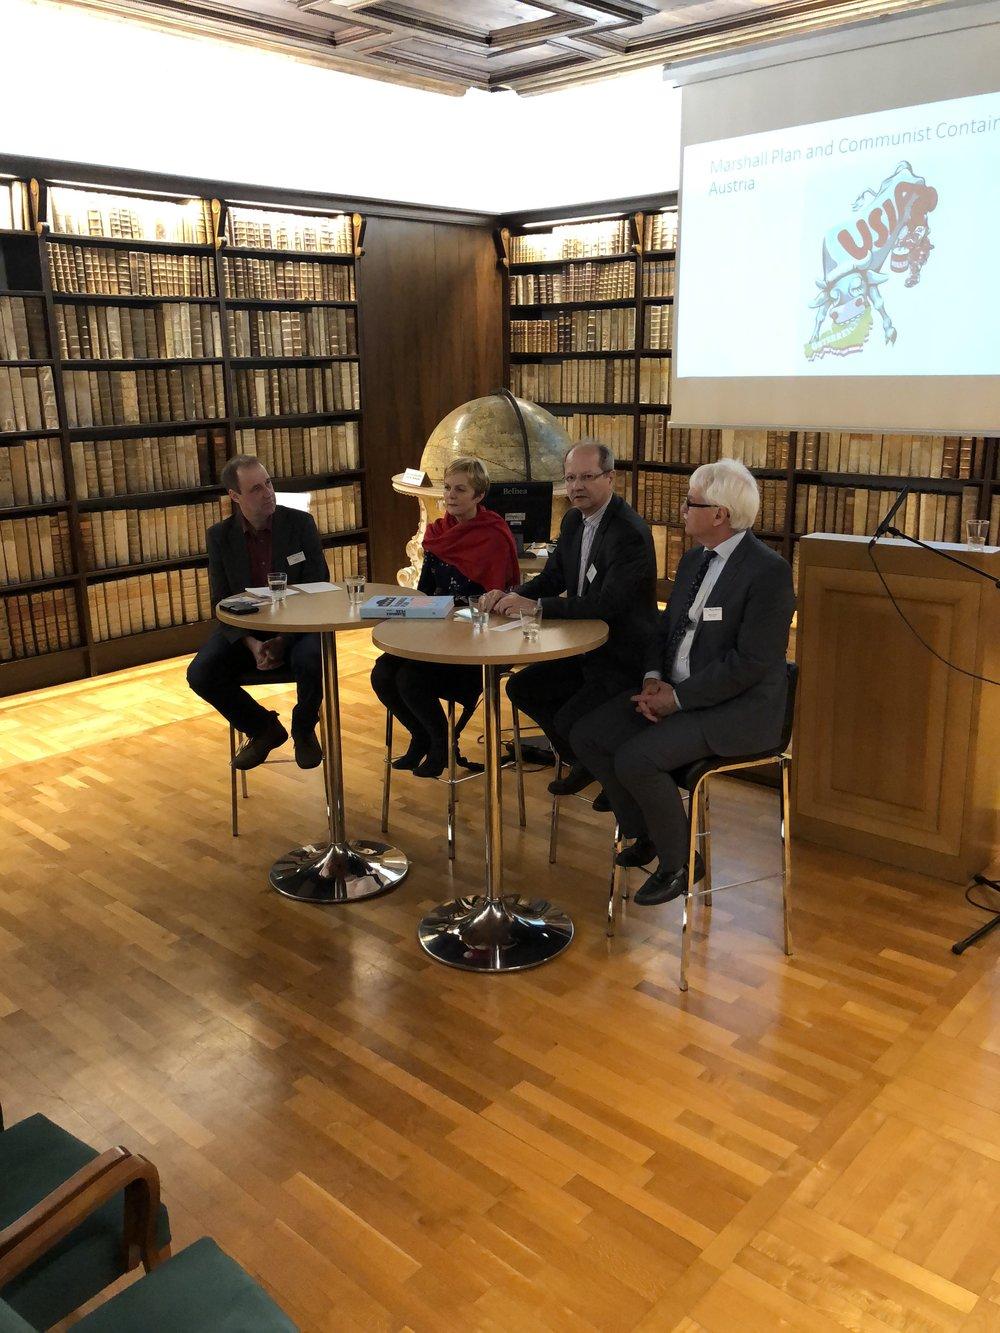 From left: Ewald Hiebl, Maria Fritsche, Hans Petschar, Guenter Bischof